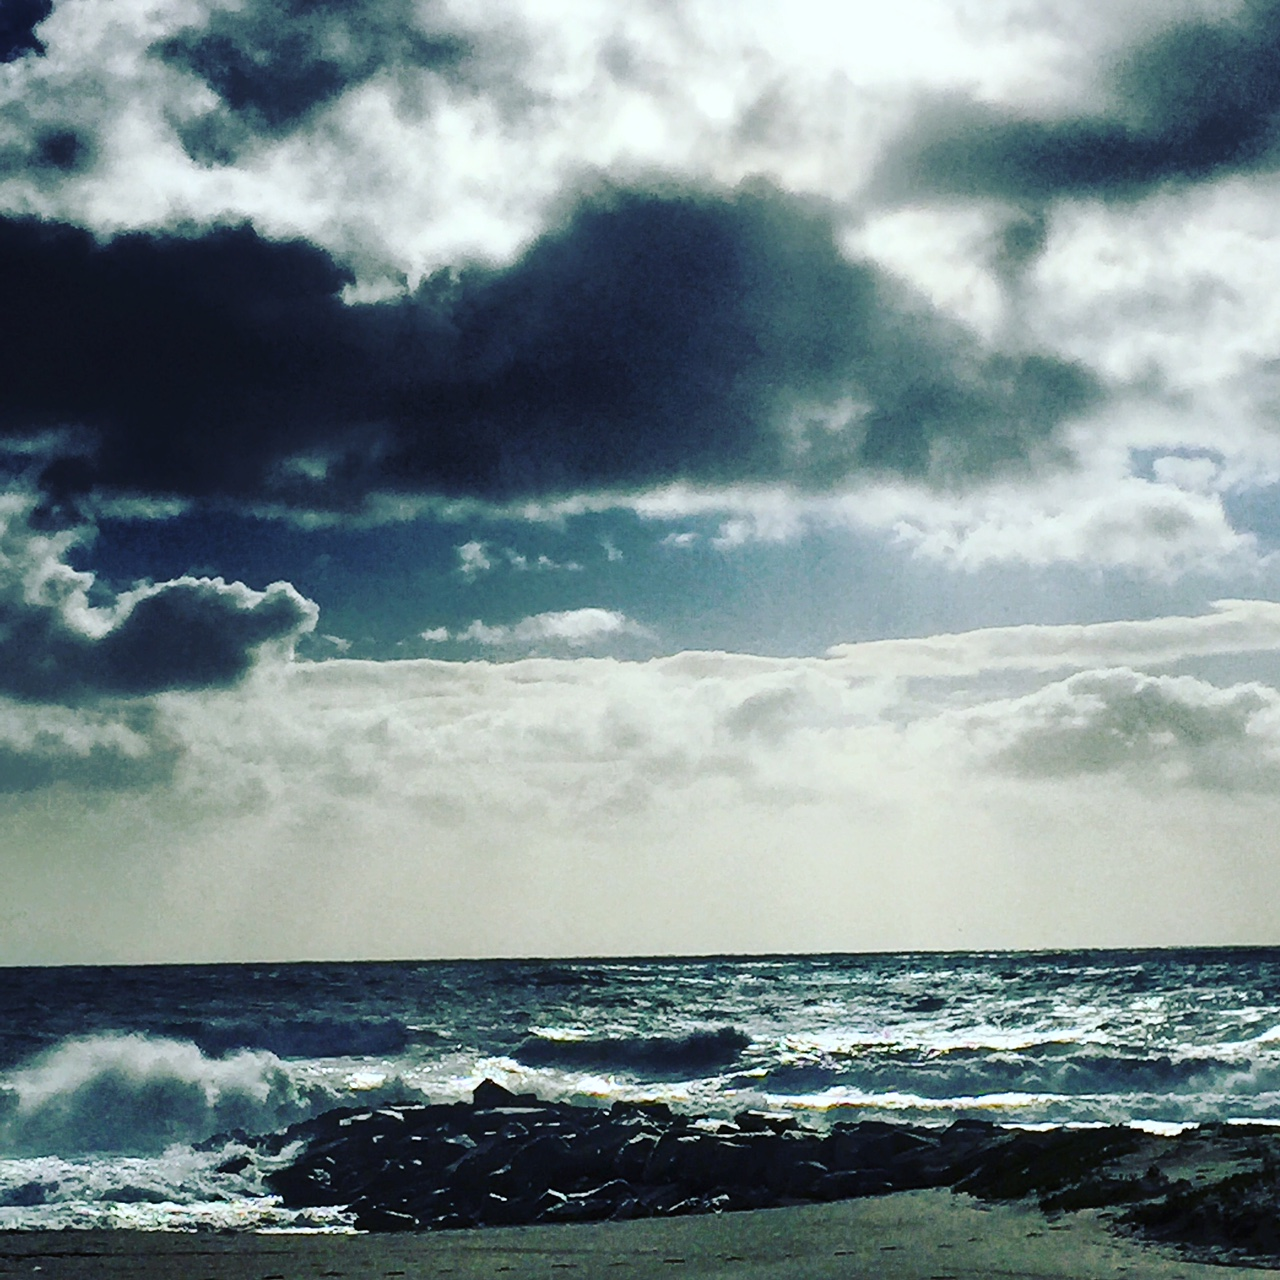 Pacific Palisades Beach